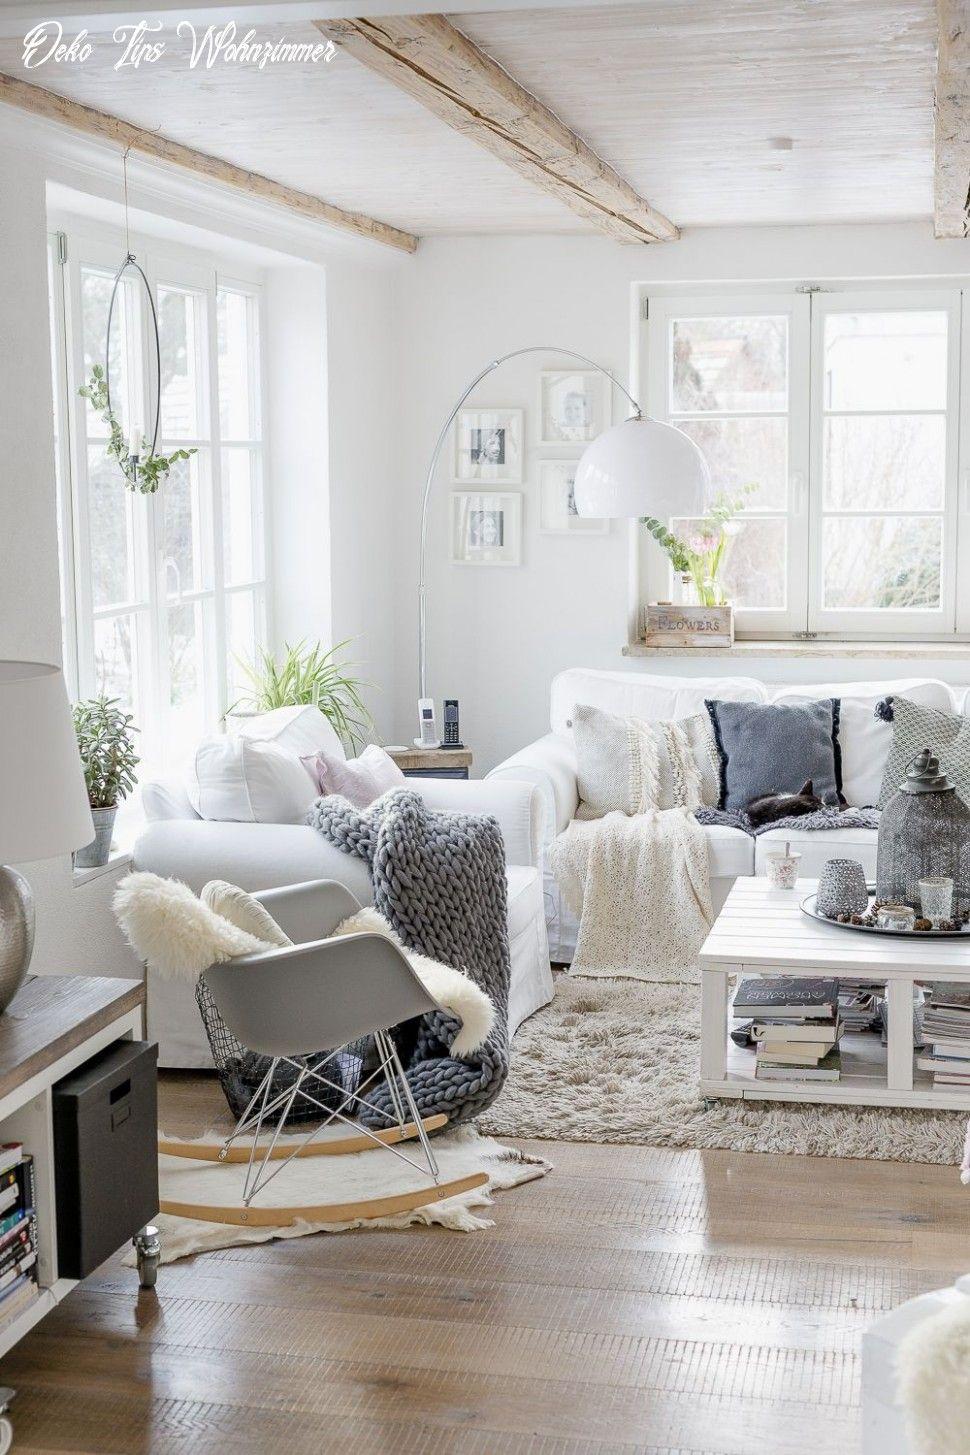 8 Deko Tipps Wohnzimmer Fotogalerie Home Decor Simplicity Sofas Rustic Sofa